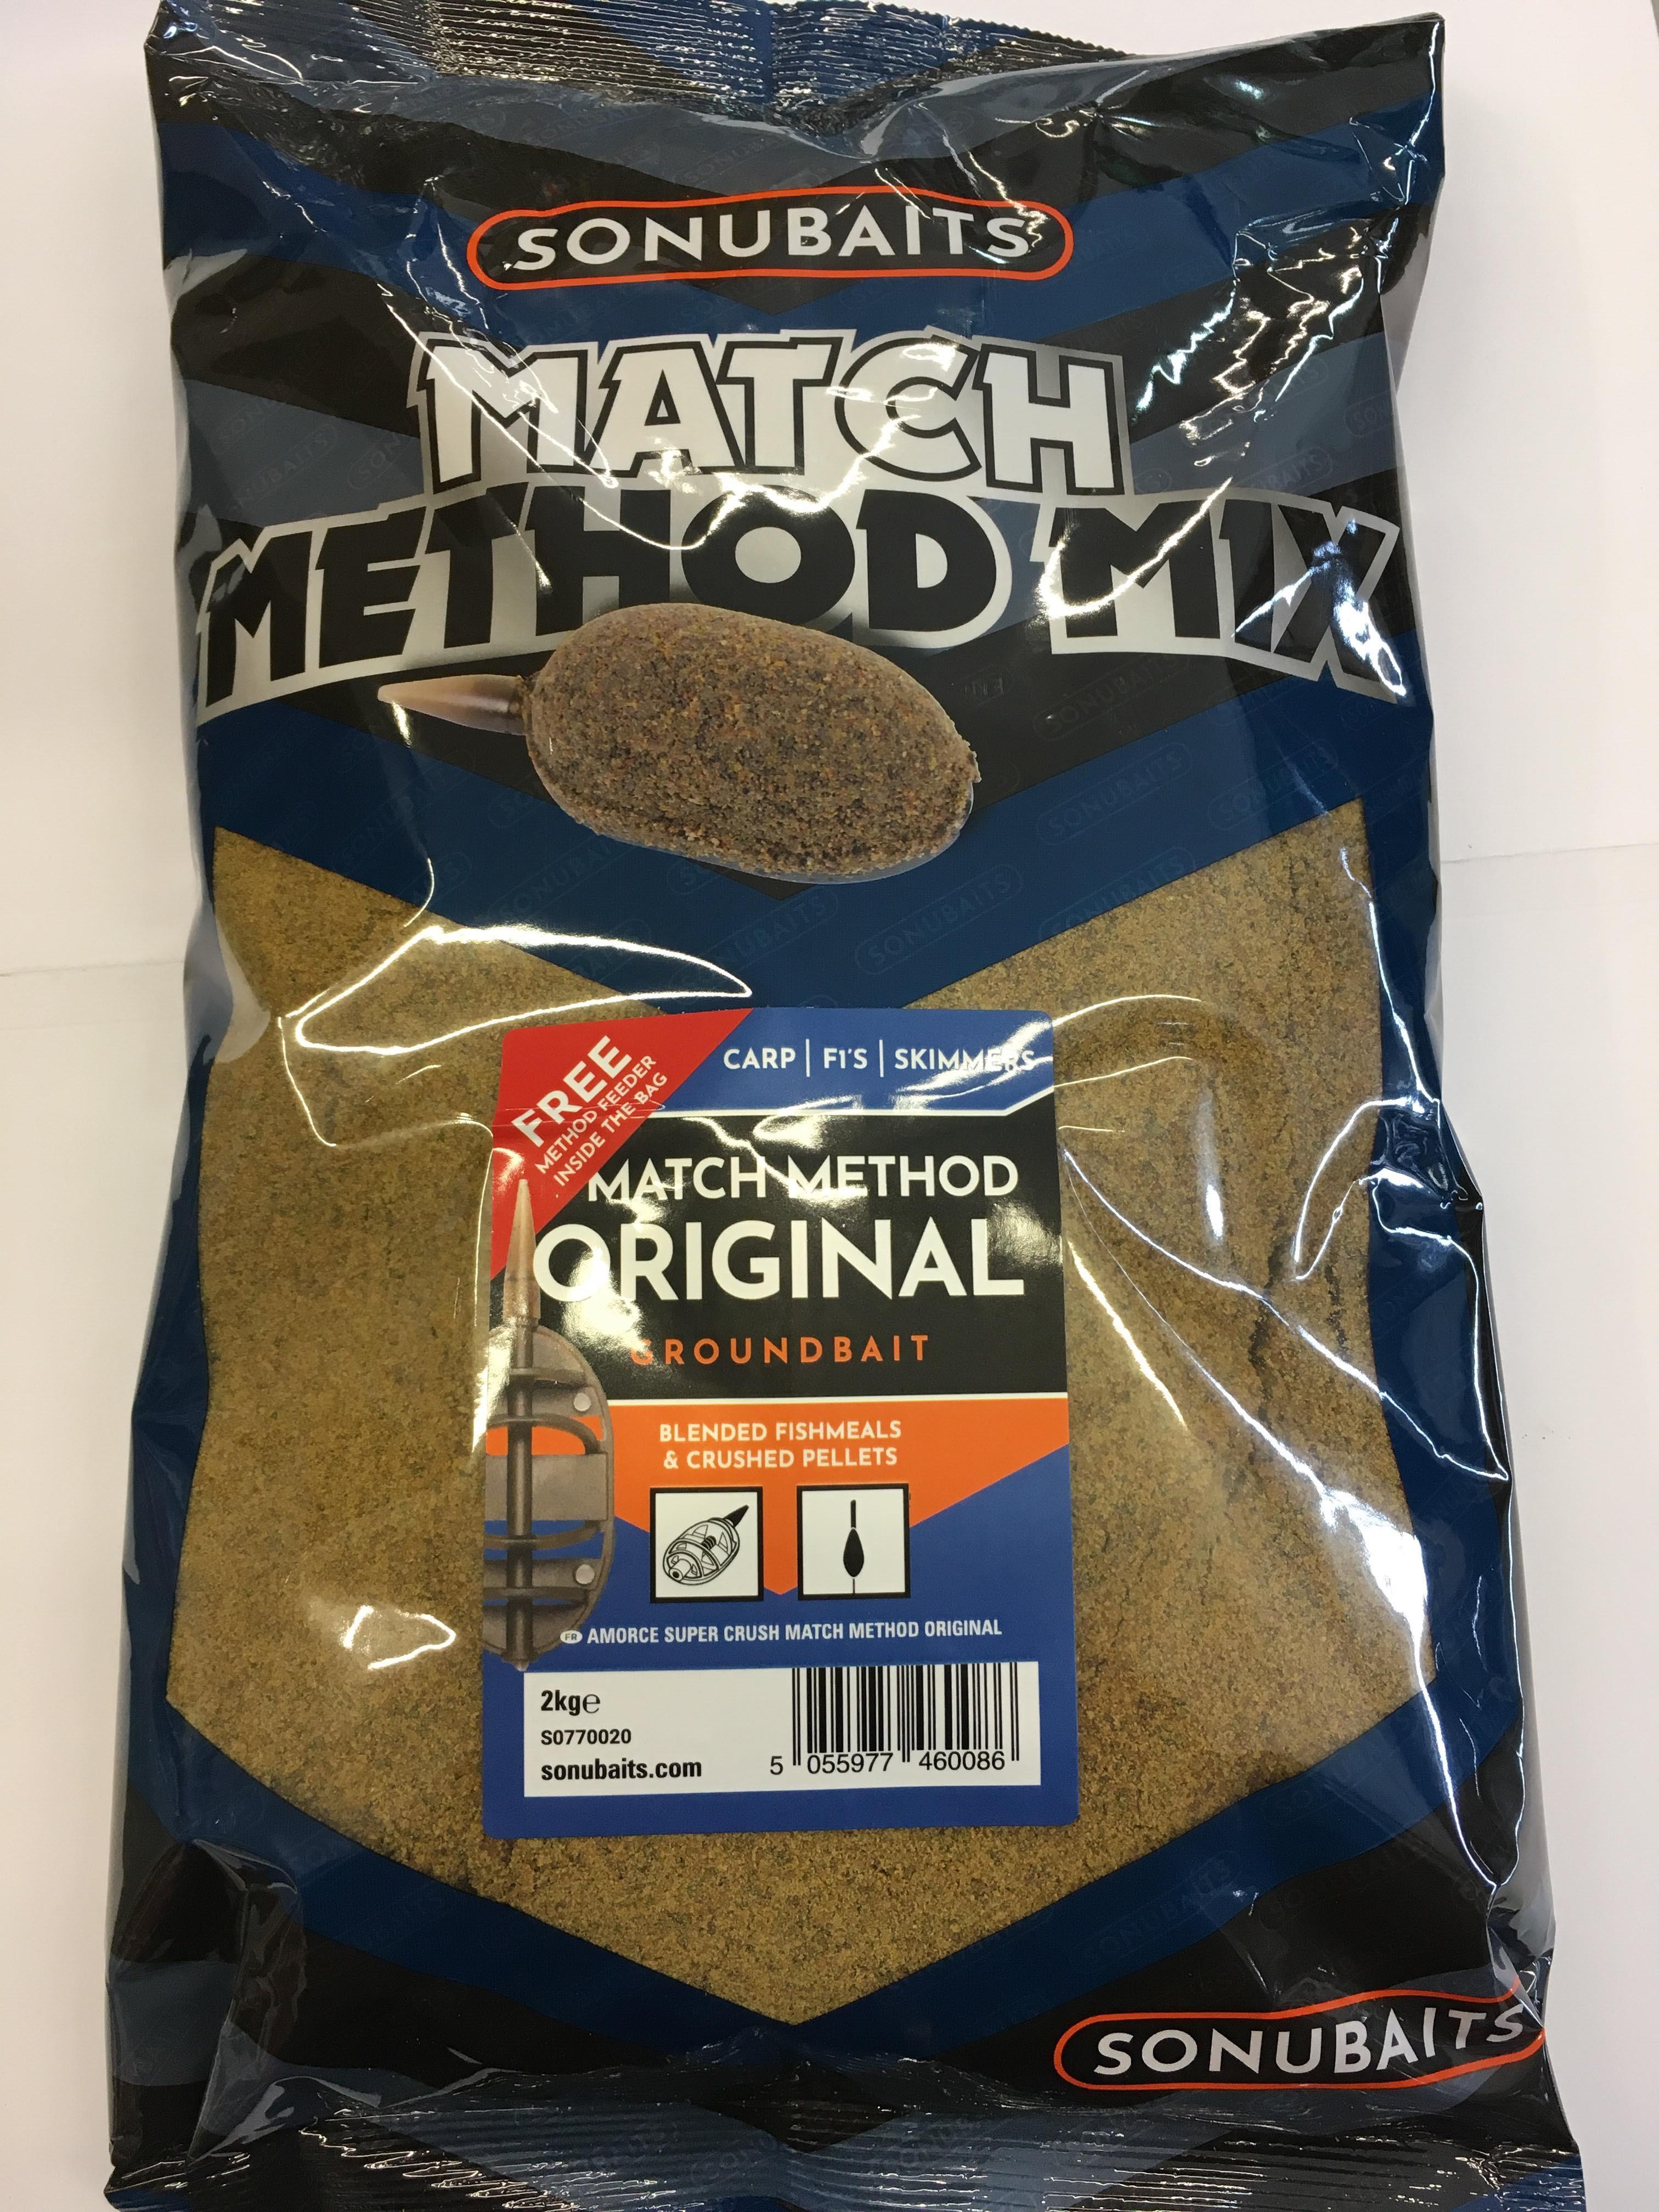 Sonubaits Match Method Mix 2kg BETS0770020